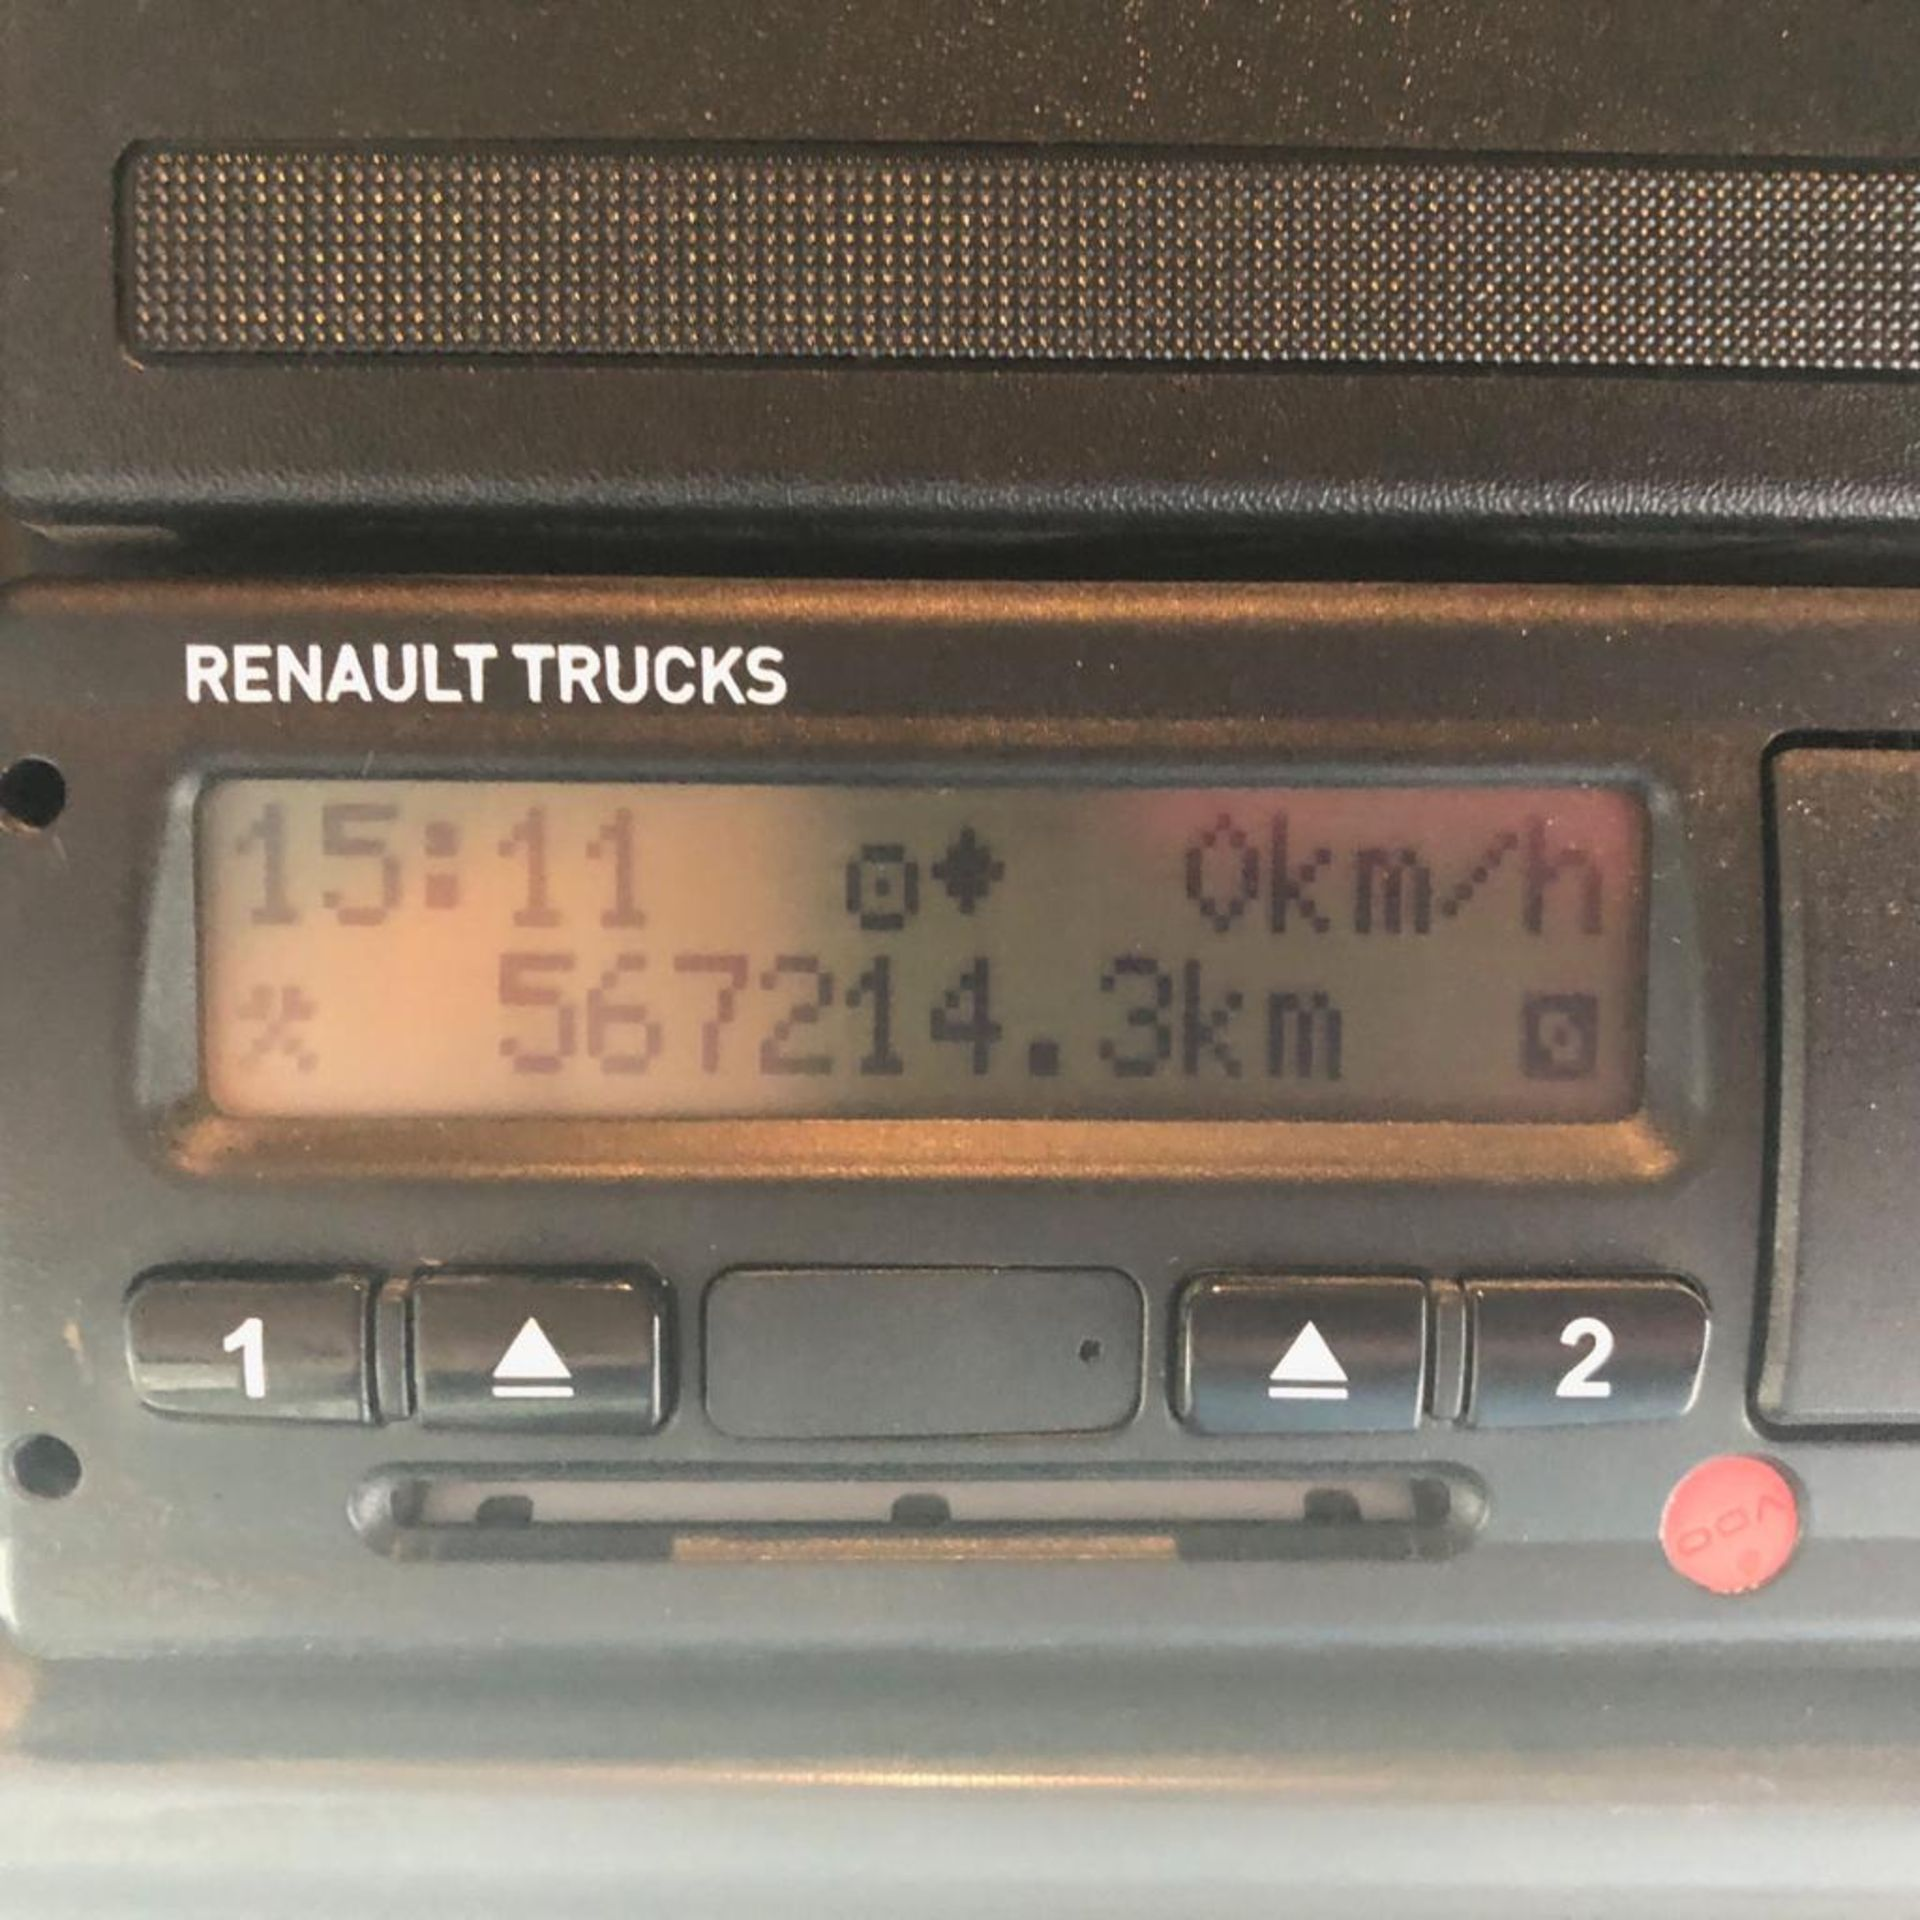 Lot 38 - 2014/14 REG RENAULT TRUCKS WHITE DIESEL HEAVY HAULAGE TRACTOR UNIT, ONLY ONE OWNER *PLUS VAT*